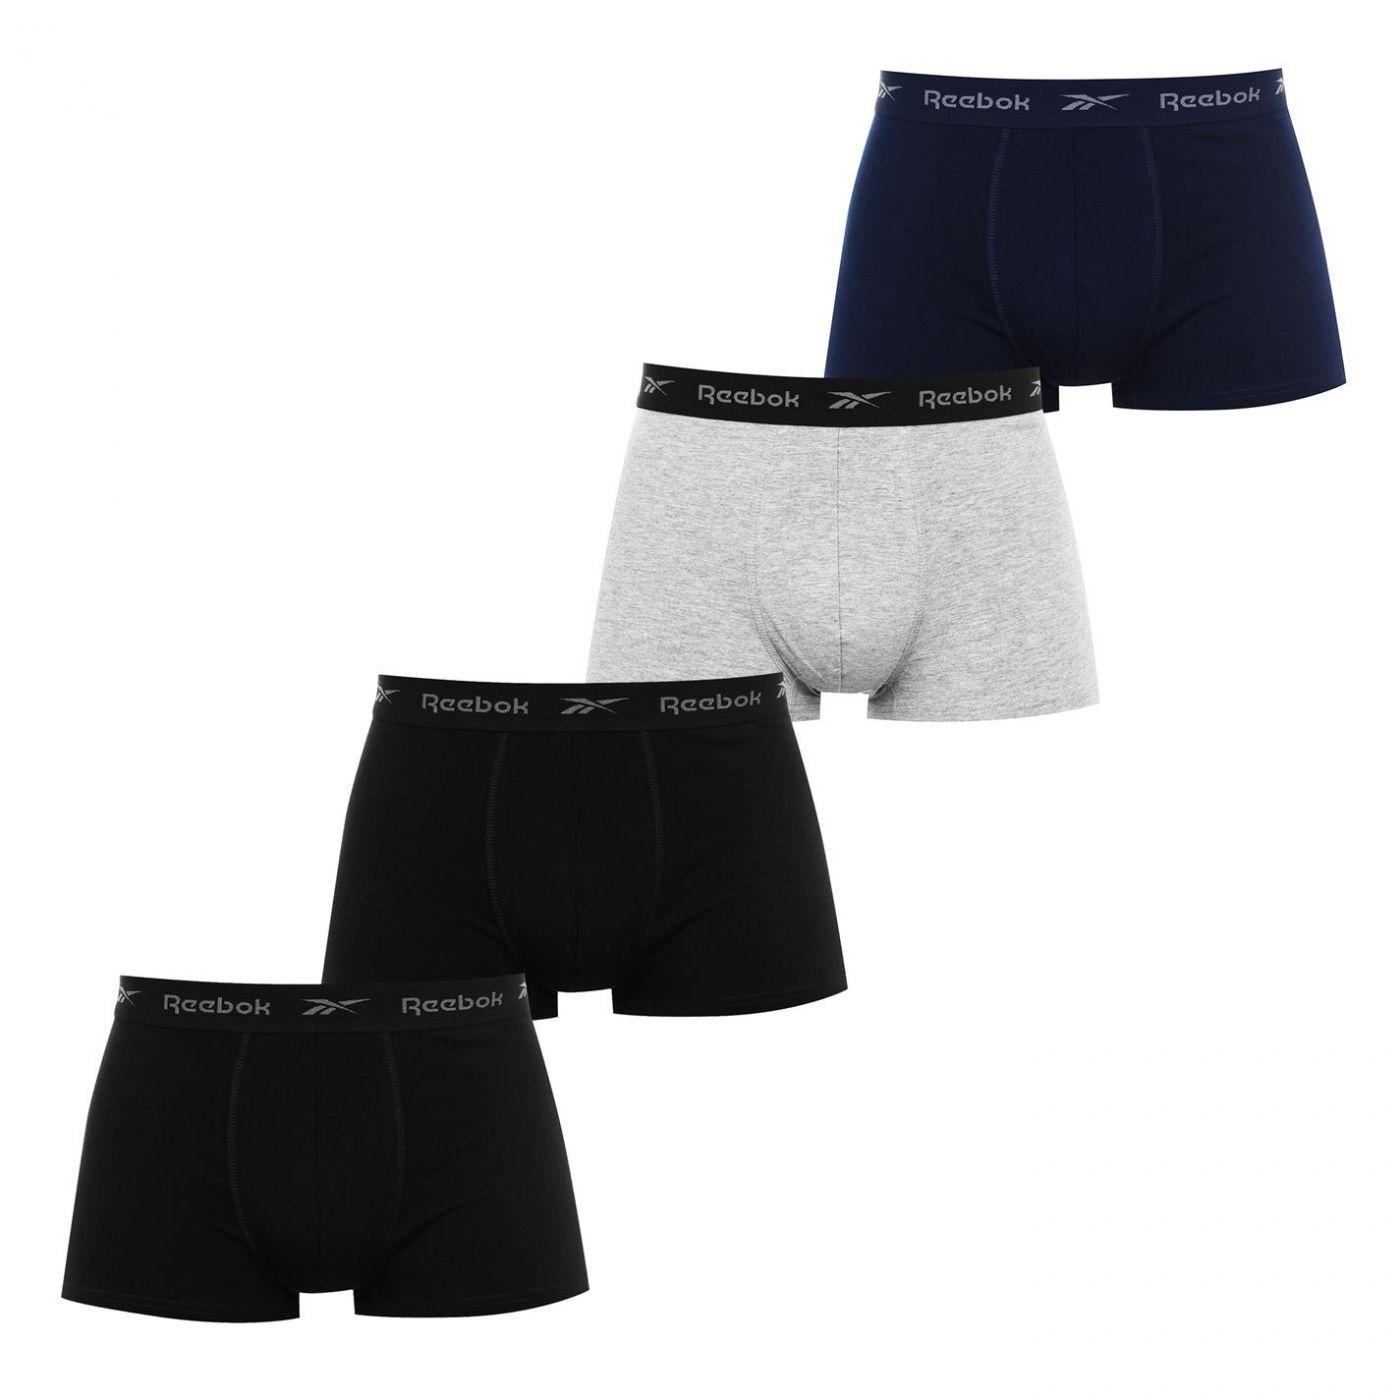 Men's boxers  Reebok 4 Pack